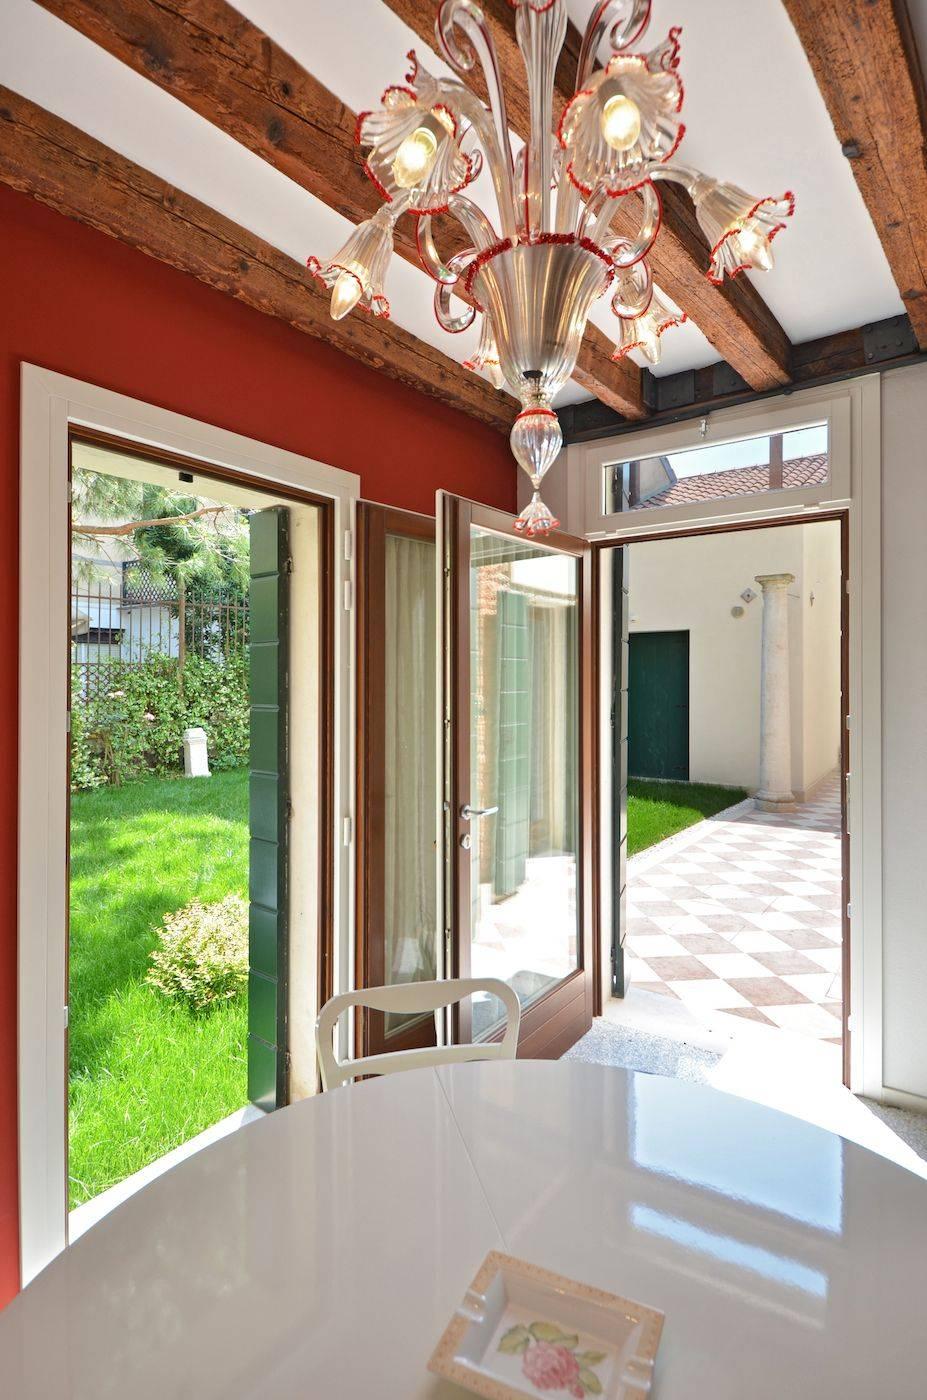 Palladio Garden contemporary style apartment with shared garden